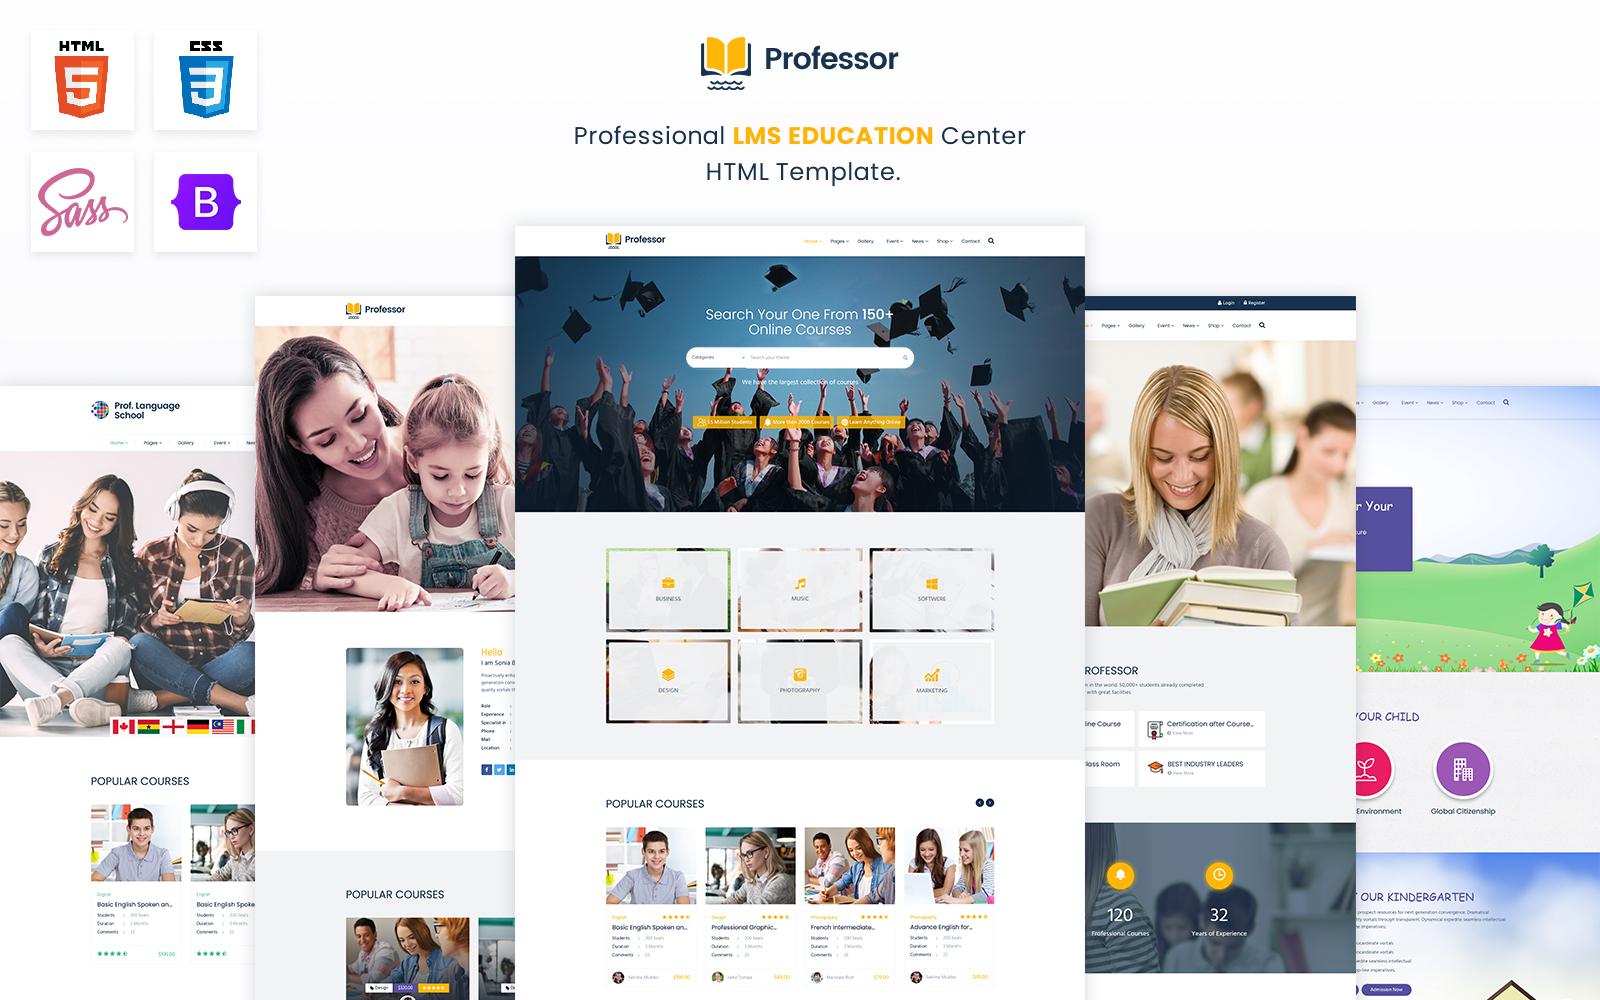 Professor-Professional LMS Education Center  HTML Template.